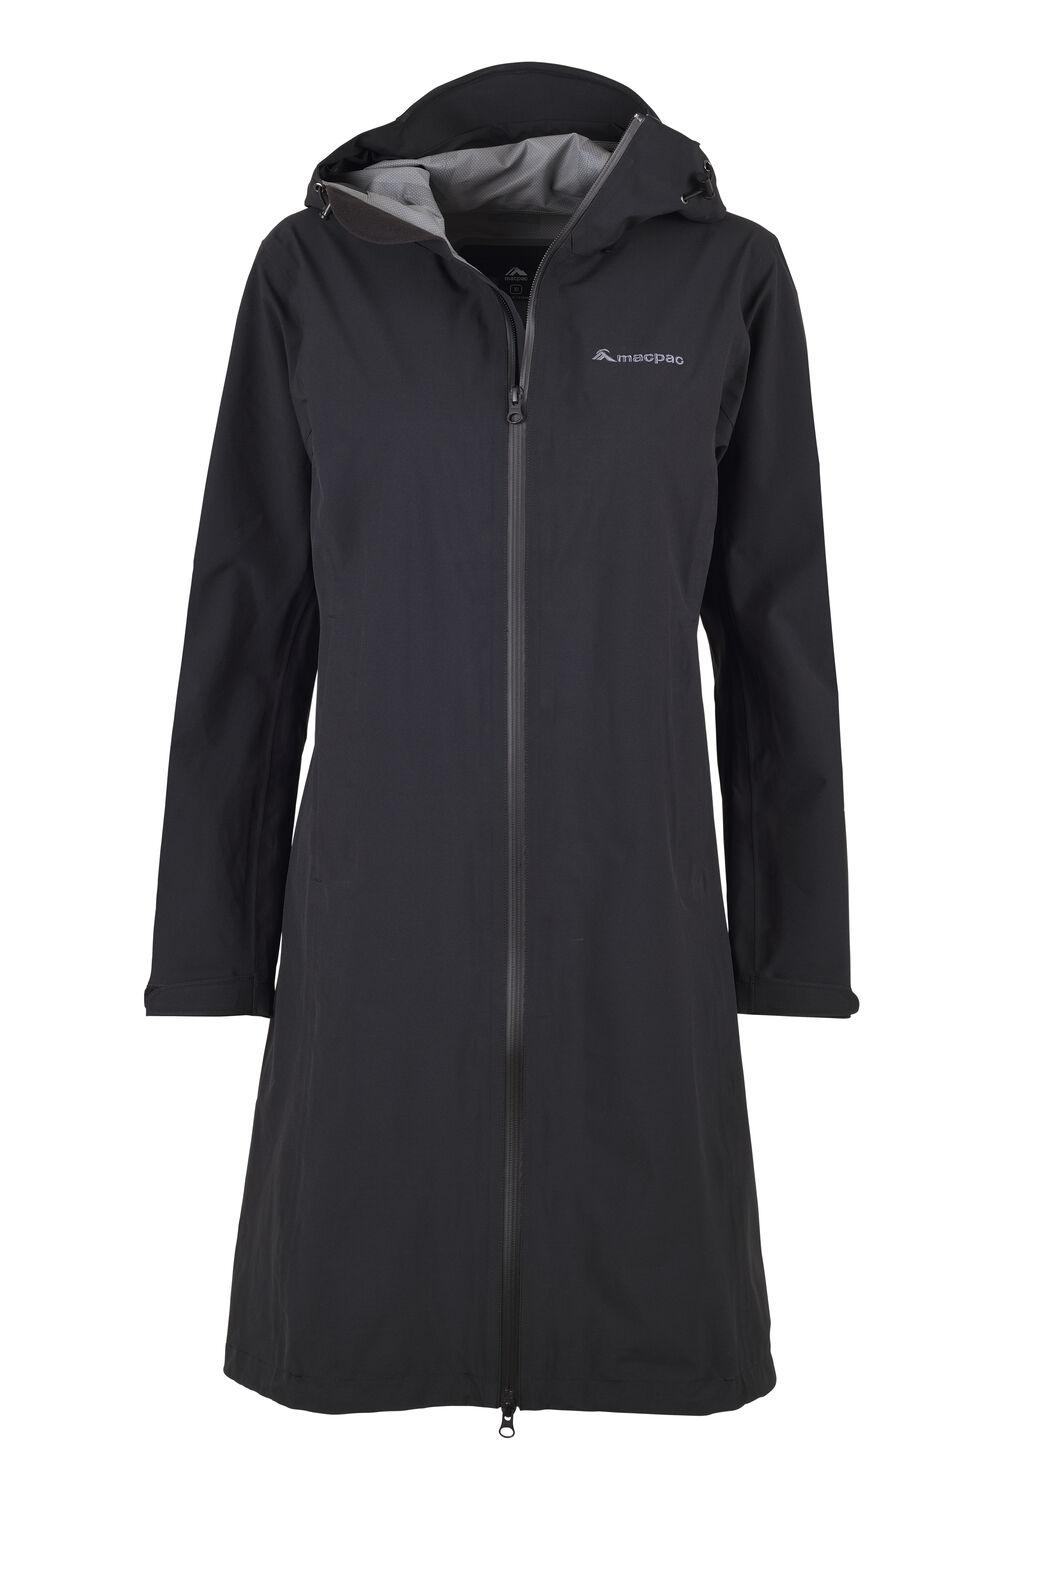 Macpac Dispatch Coat - Women's, Black, hi-res